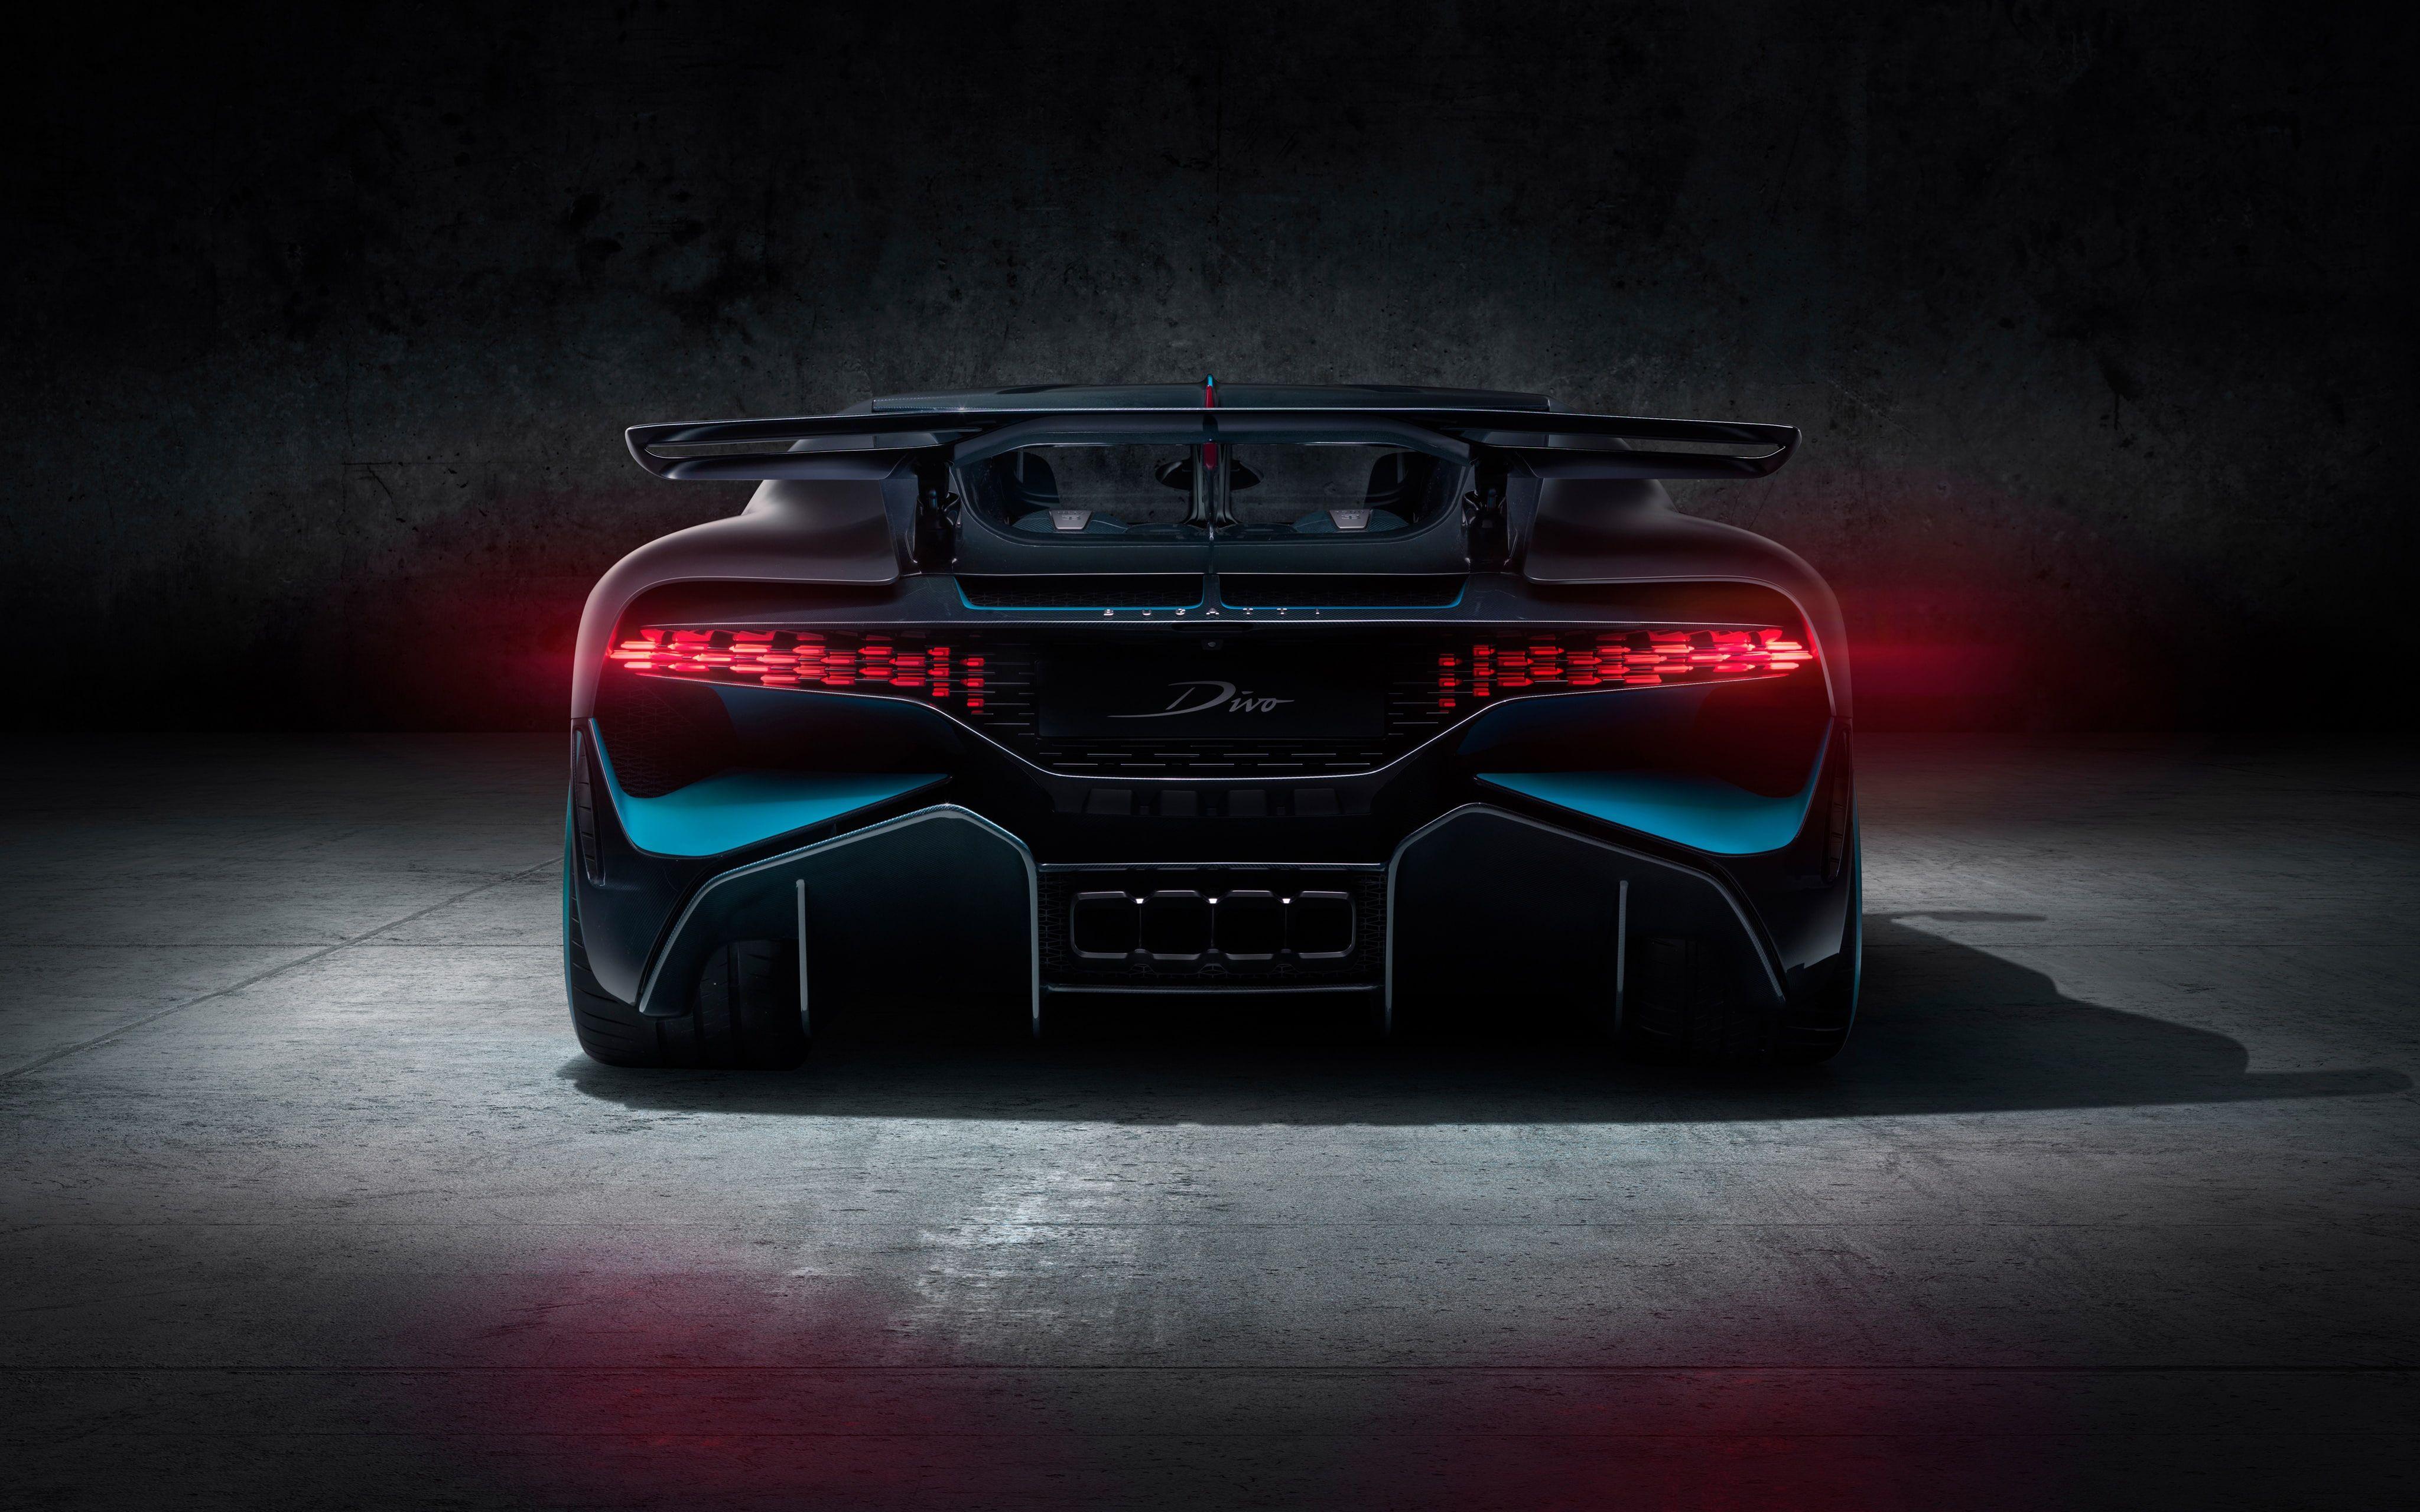 Pin By Selton Imbassahy On Lujss In 2021 Bugatti Divo Bugatti Porsche Sports Car